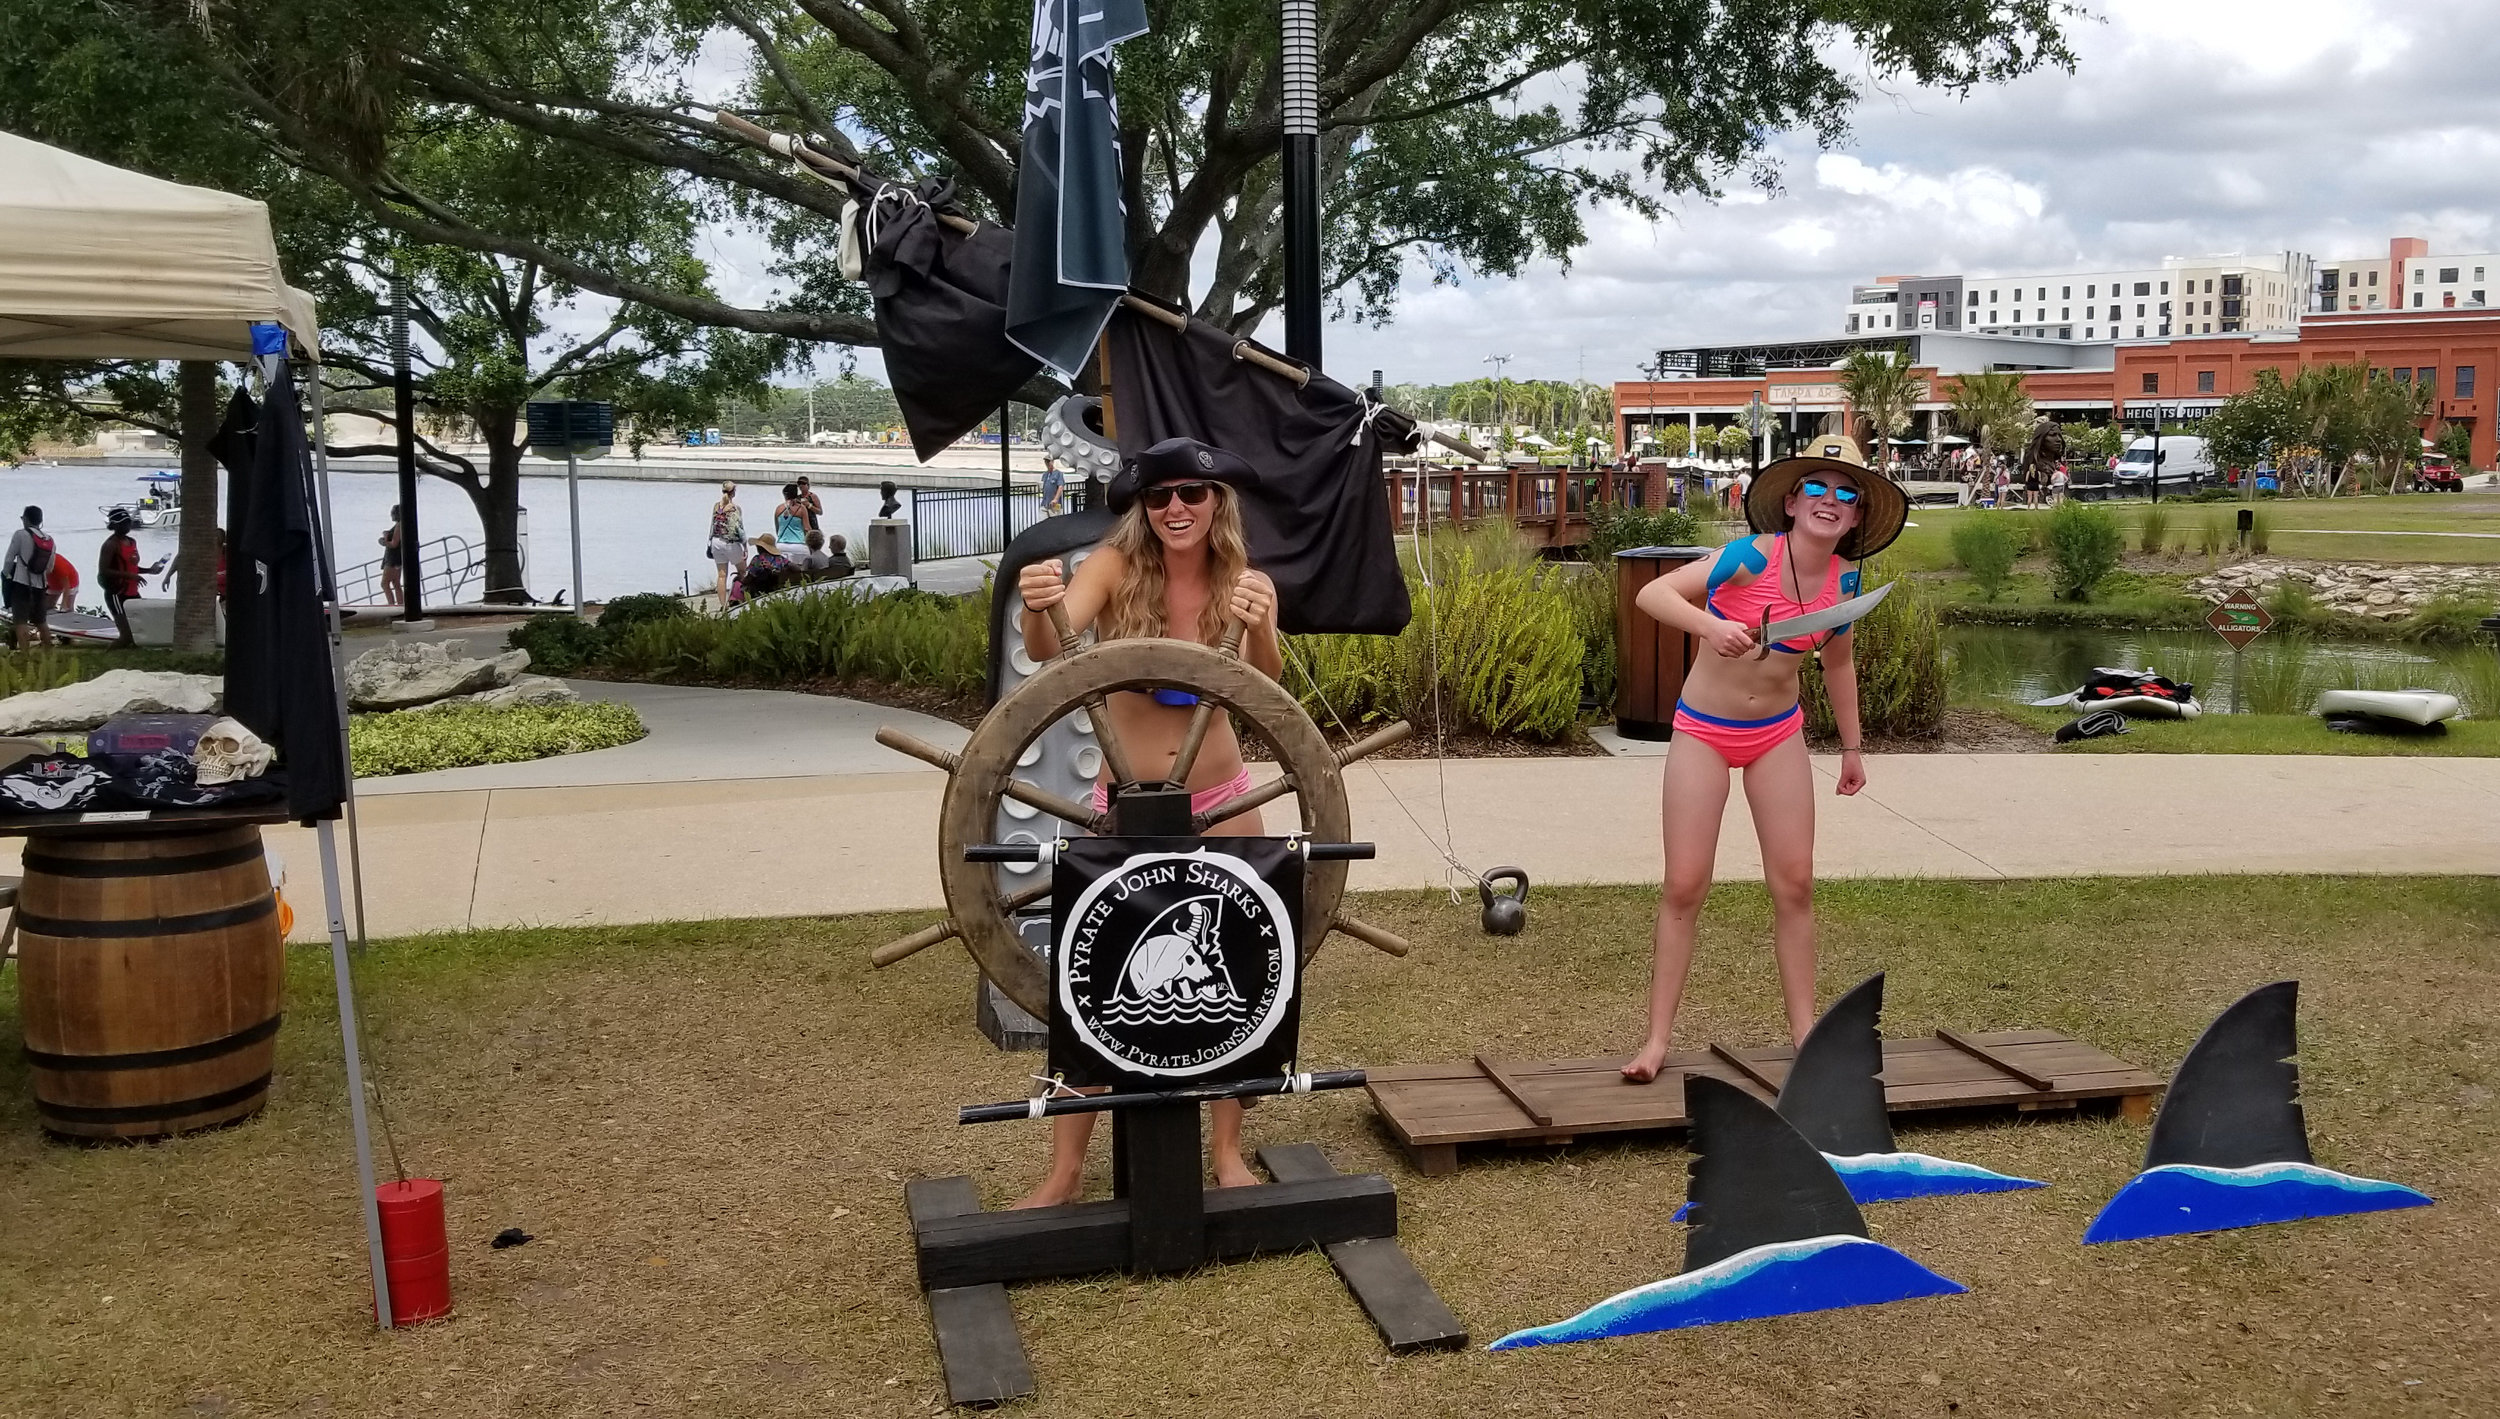 Pyrate Prop Setup at Gasparilla SUP Invasion 2018